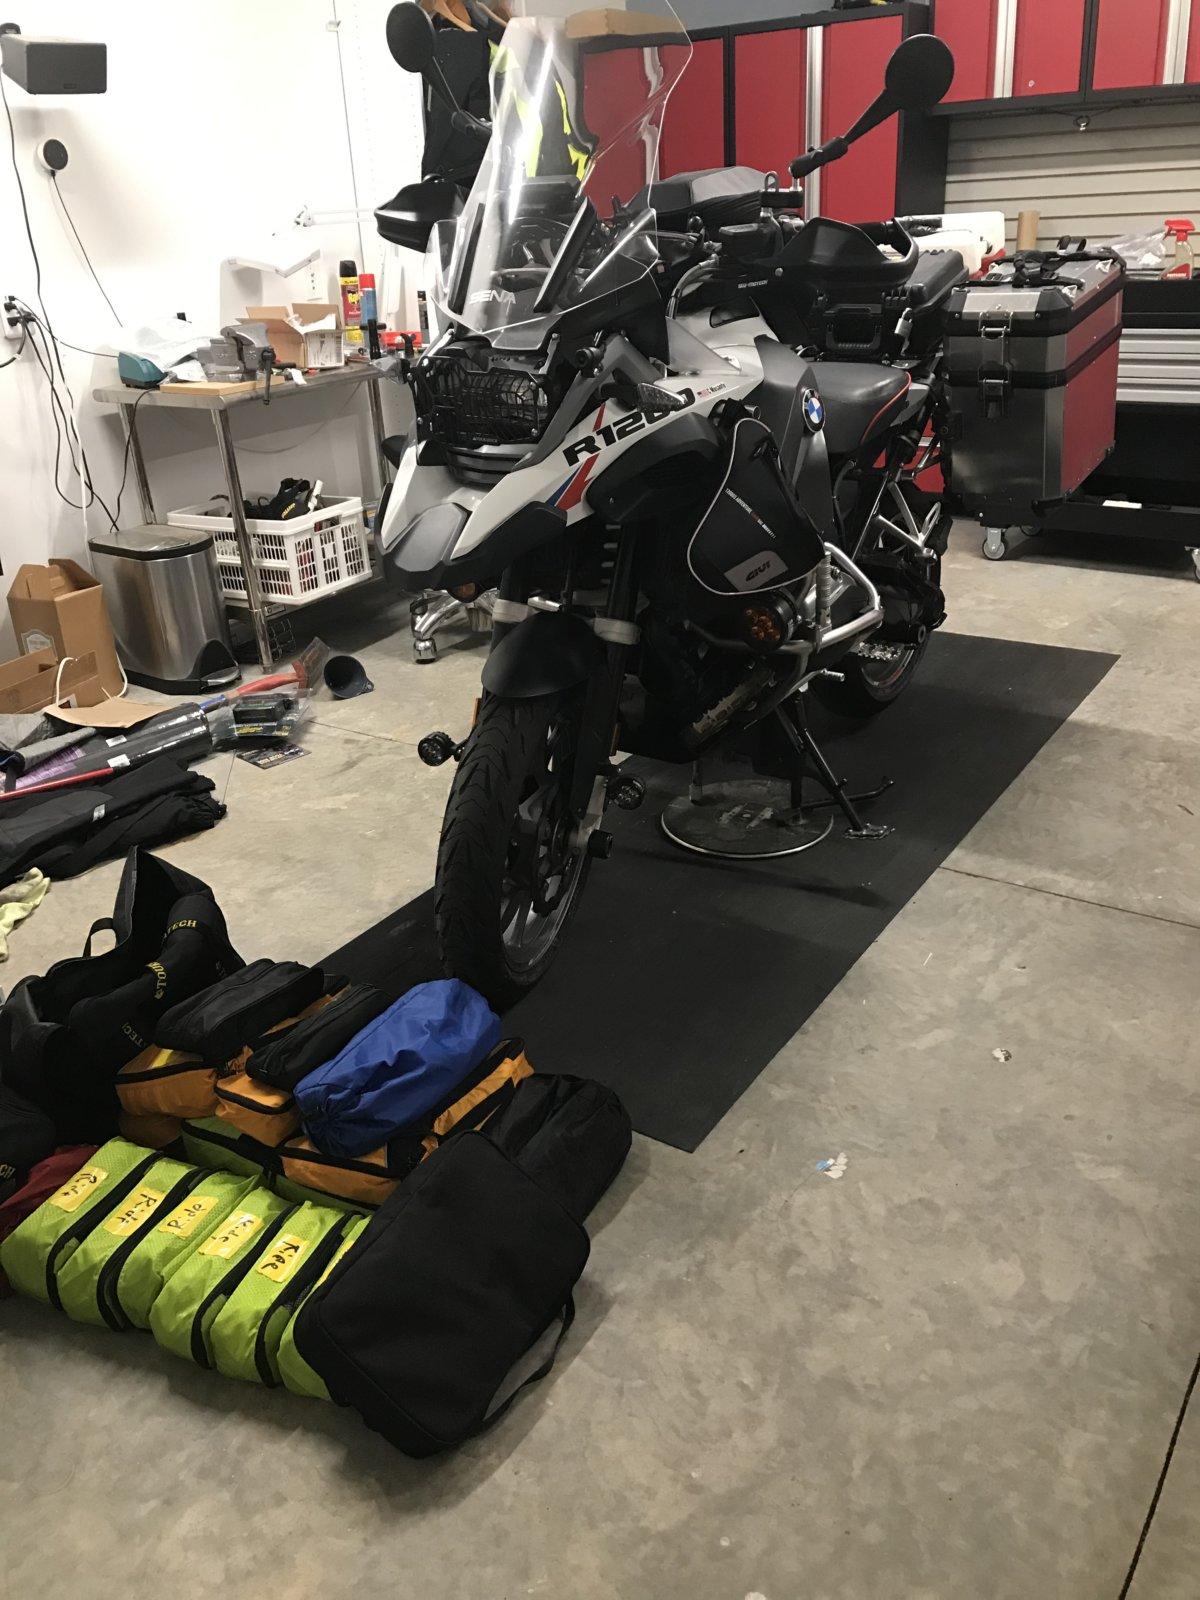 07-10 Bike With Luggage 1